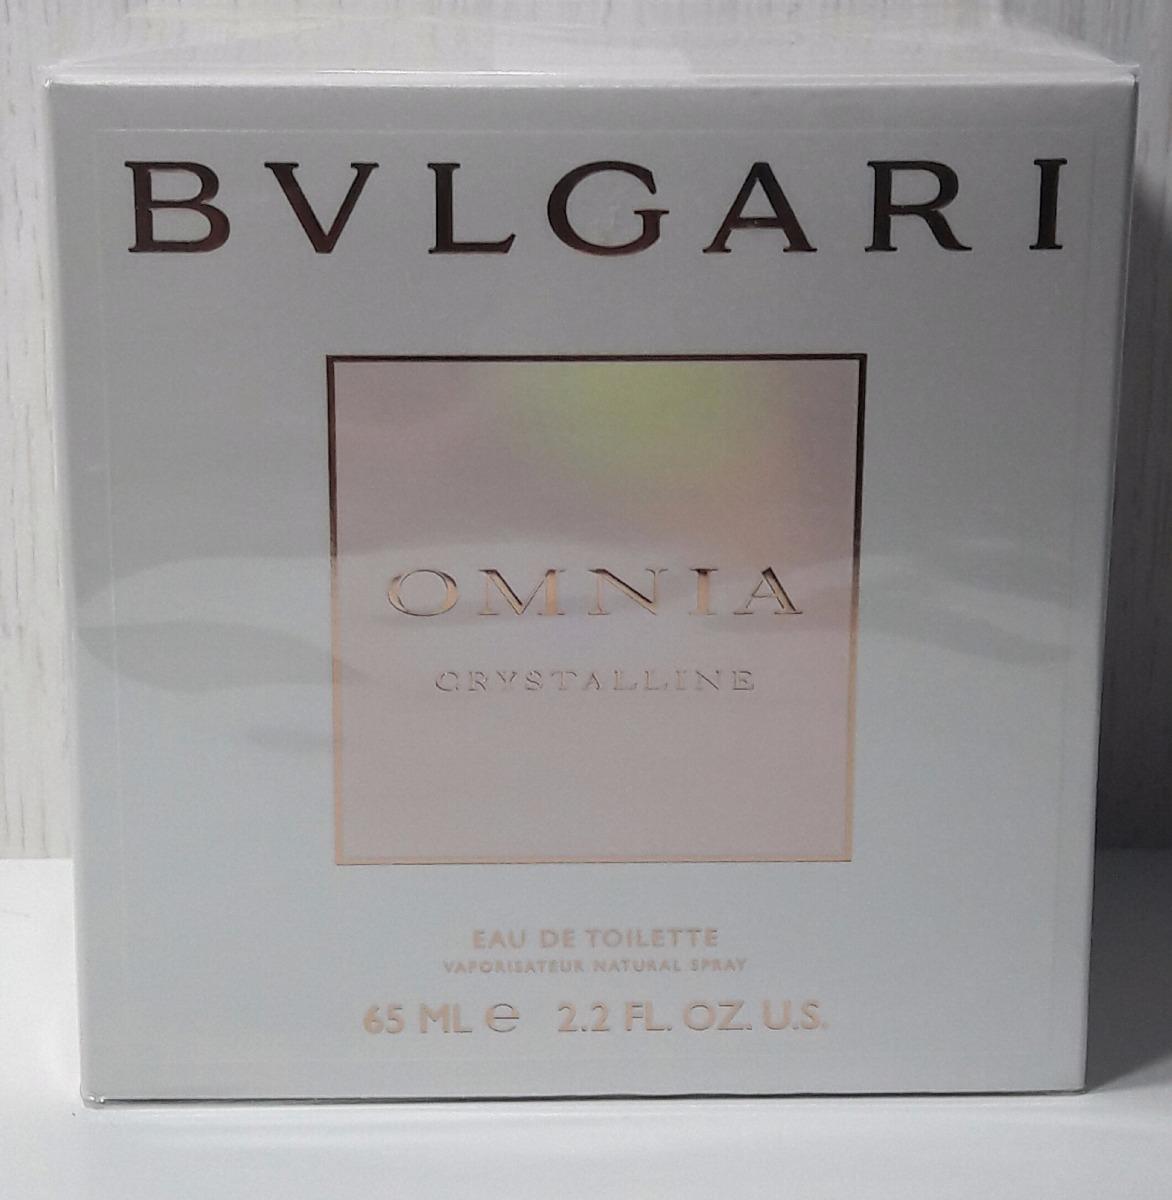 82f58843a9730 Perfume Bvlgari Omnia Crystalline Edt 65 Ml Original! - R  239,50 em ...